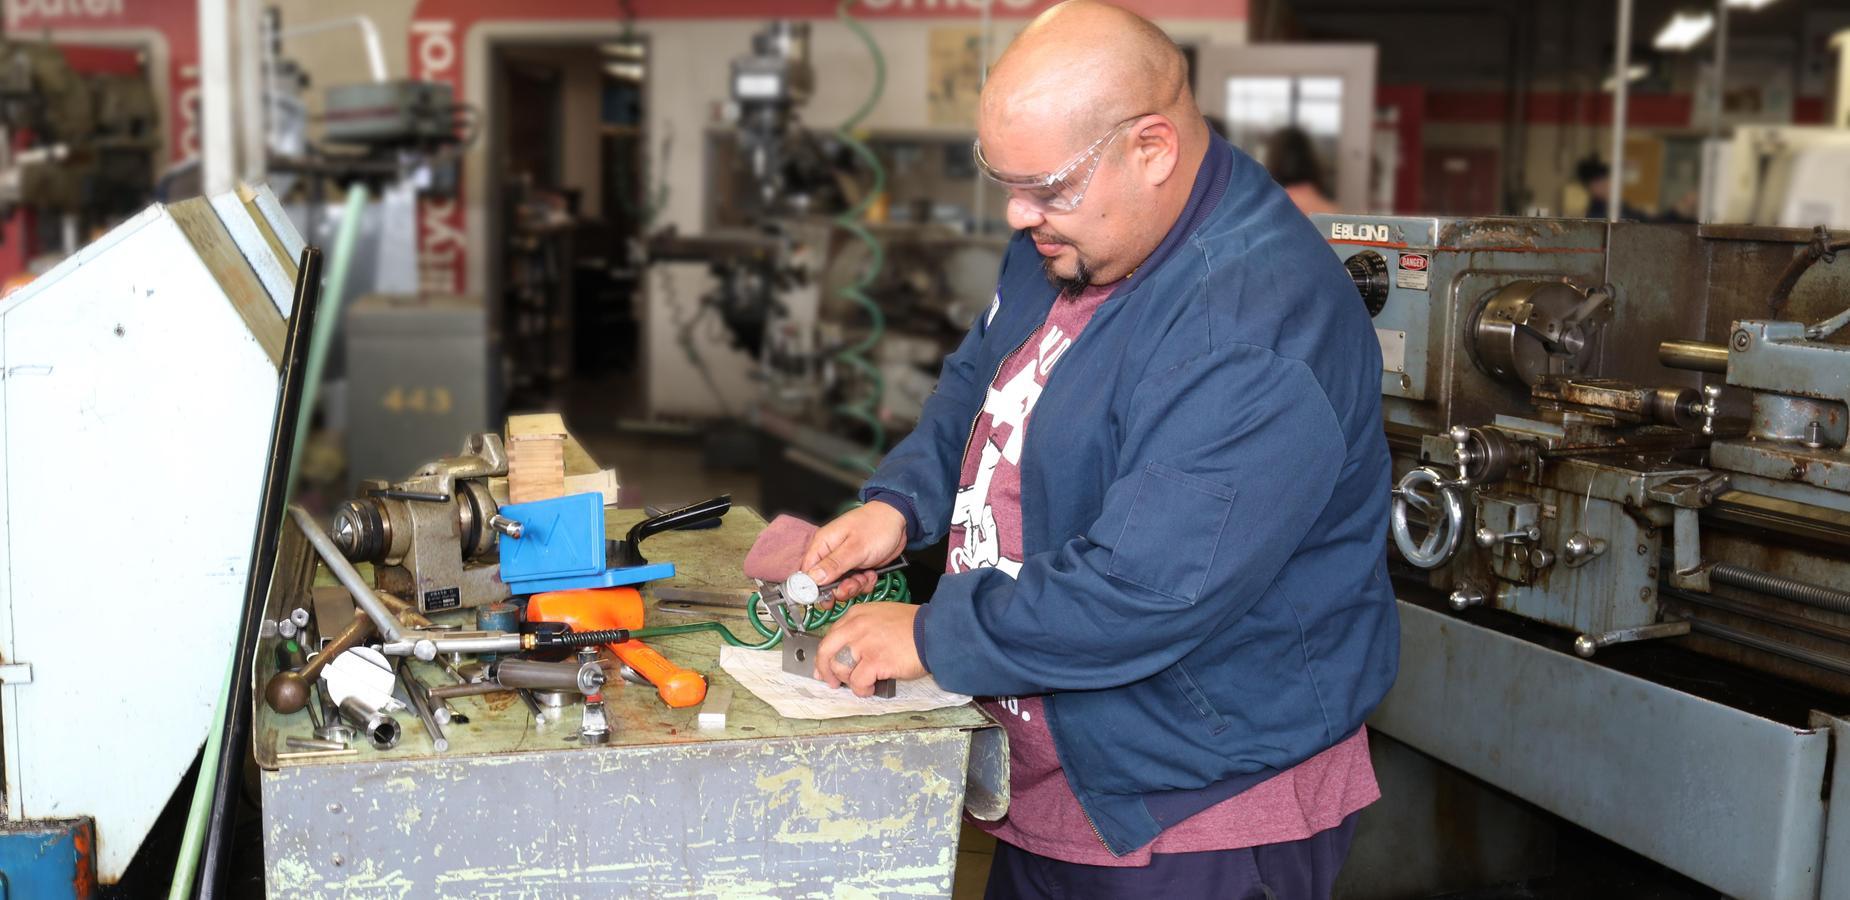 Machinist Program: CNC and MasterCAM Training